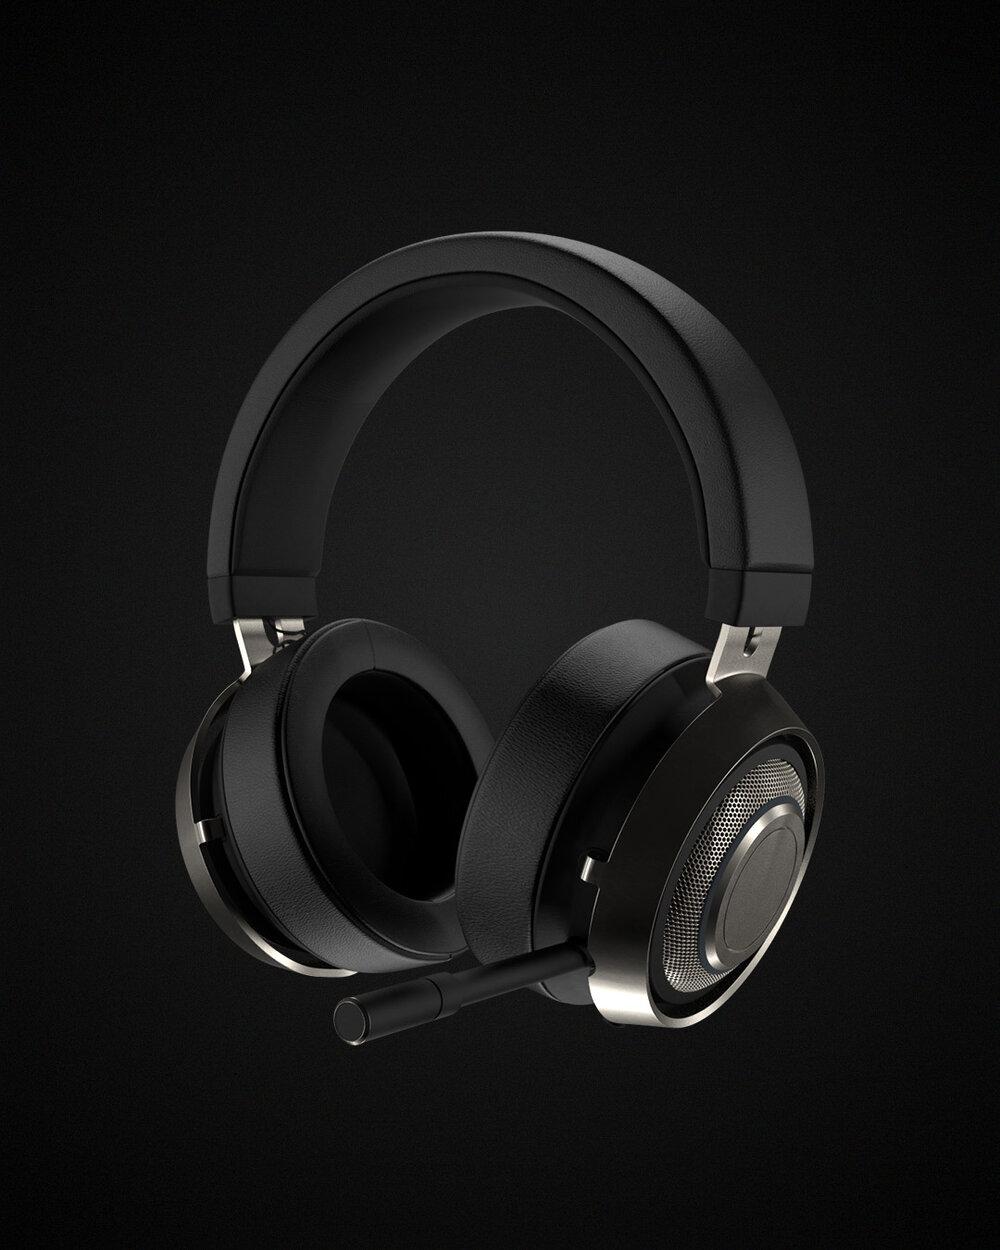 Headset_SideLeftView.jpg